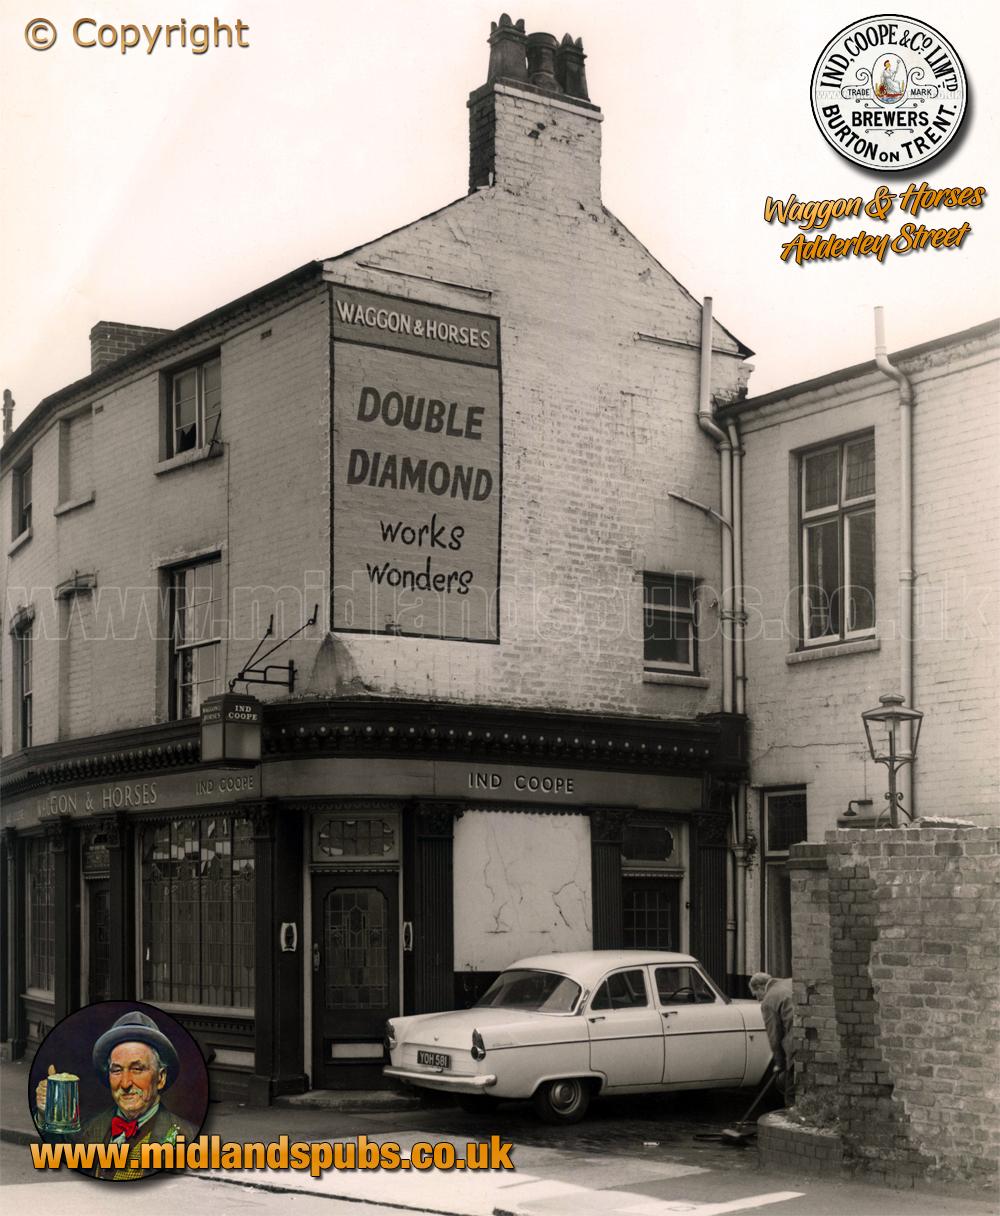 Birmingham : The Waggon and Horses on Adderley Street in Bordesley [1978]